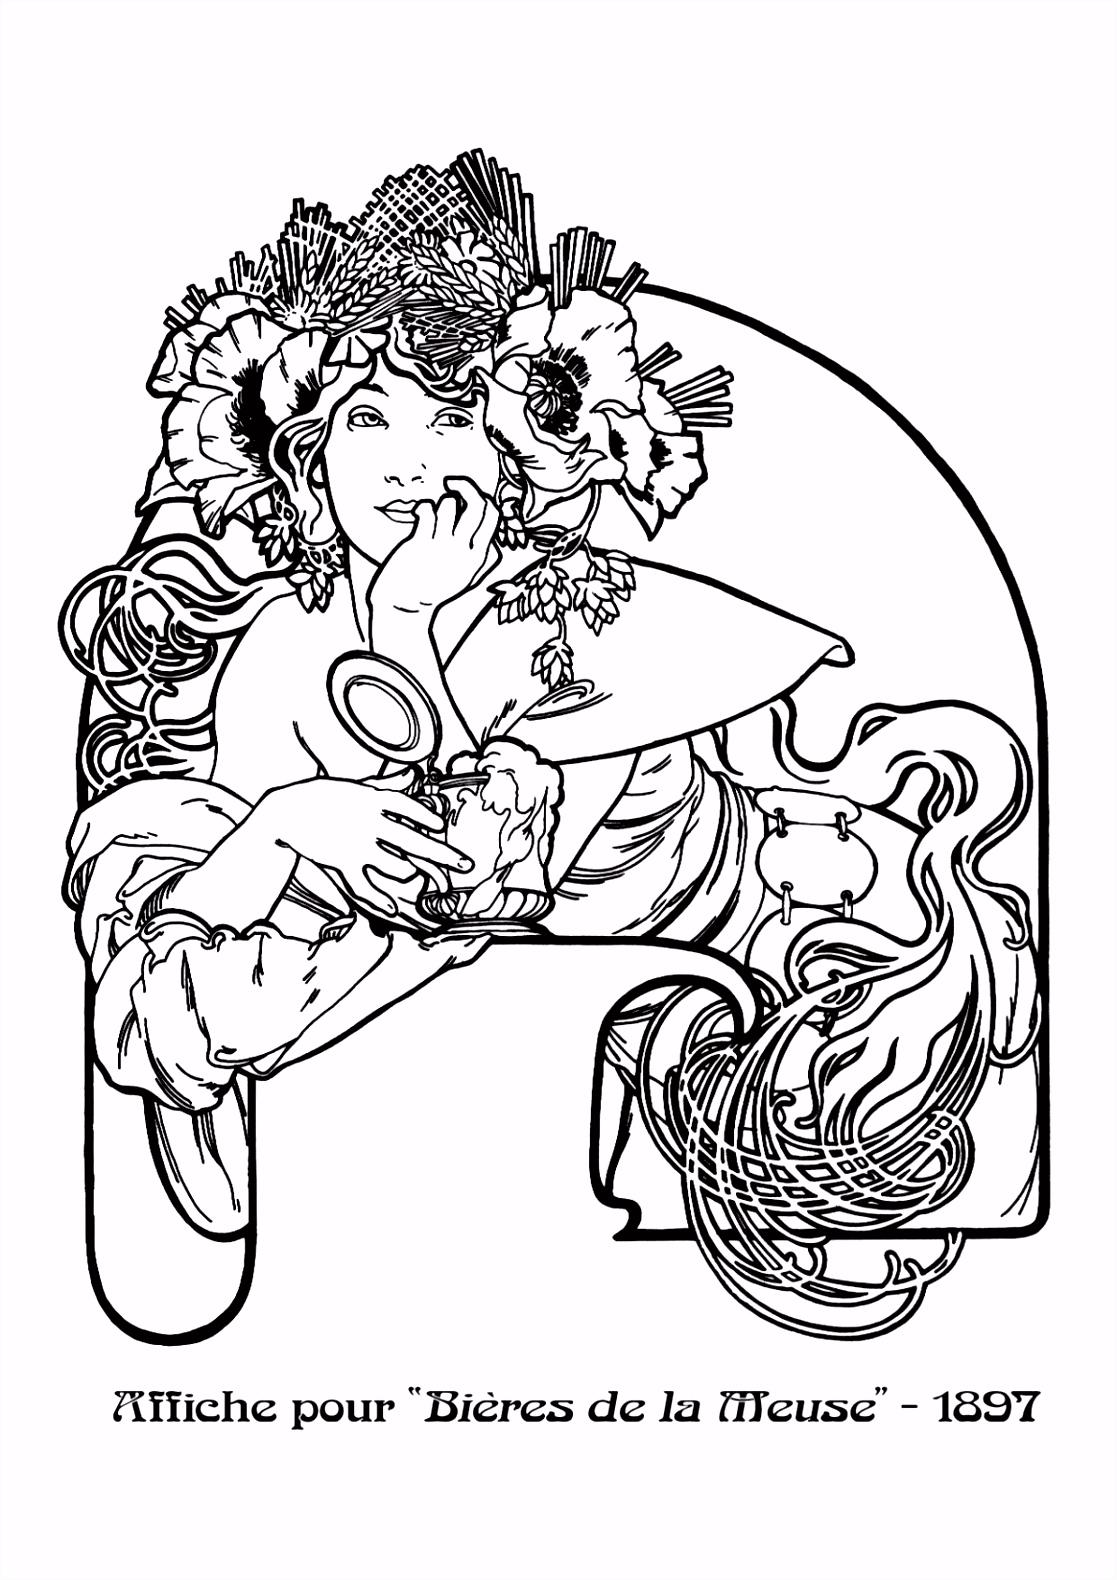 Kleurplaat naar Alfons Mucha Colouring Picture A Mucha like Bi¨res